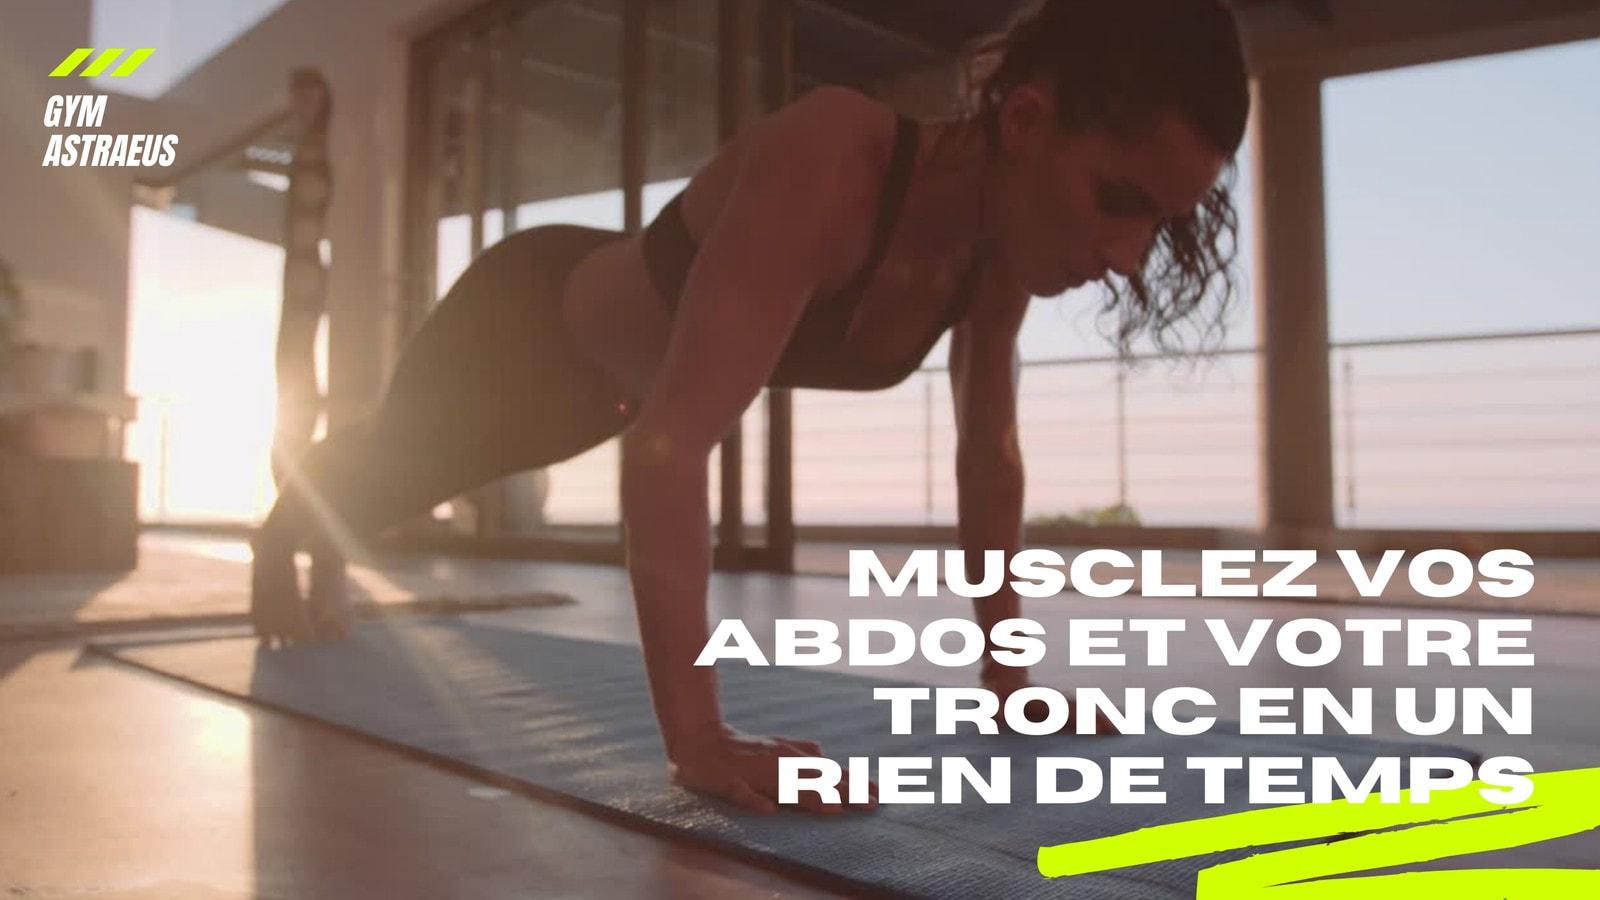 Blanc et Fluo Vert Moderne Fitness 16/9 Vidéo